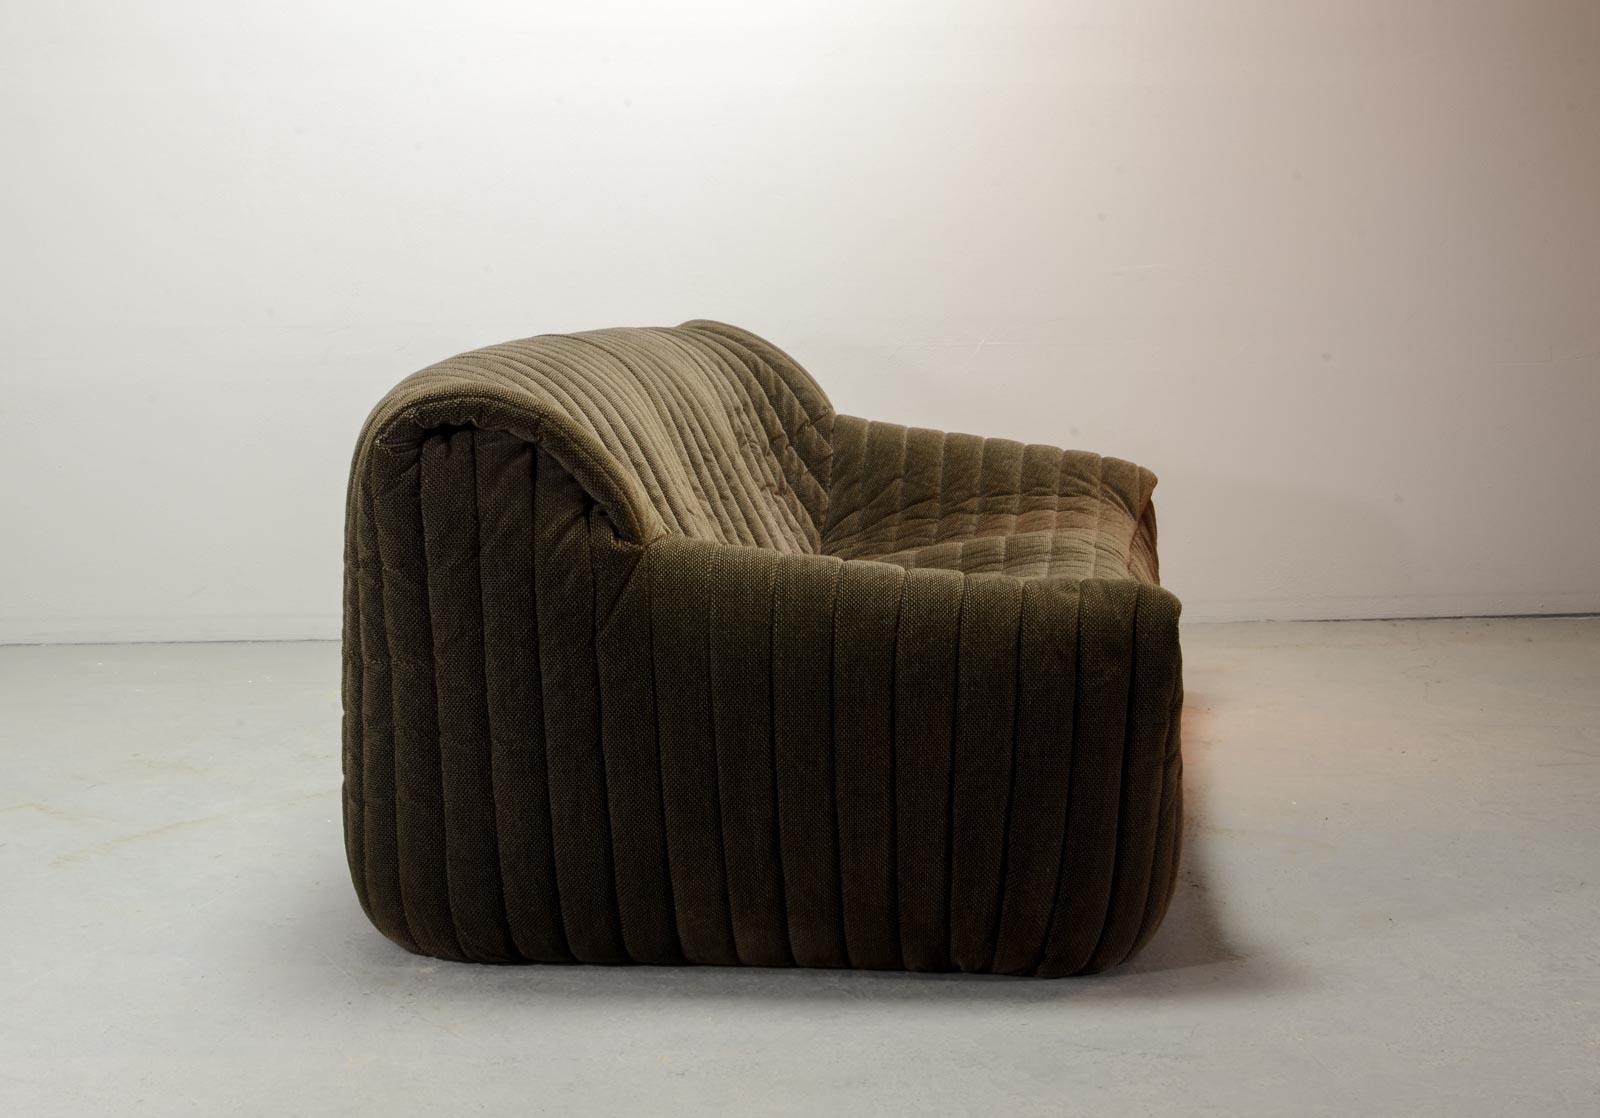 midcentury three seat sofa by annie hieronymus for cinna. Black Bedroom Furniture Sets. Home Design Ideas